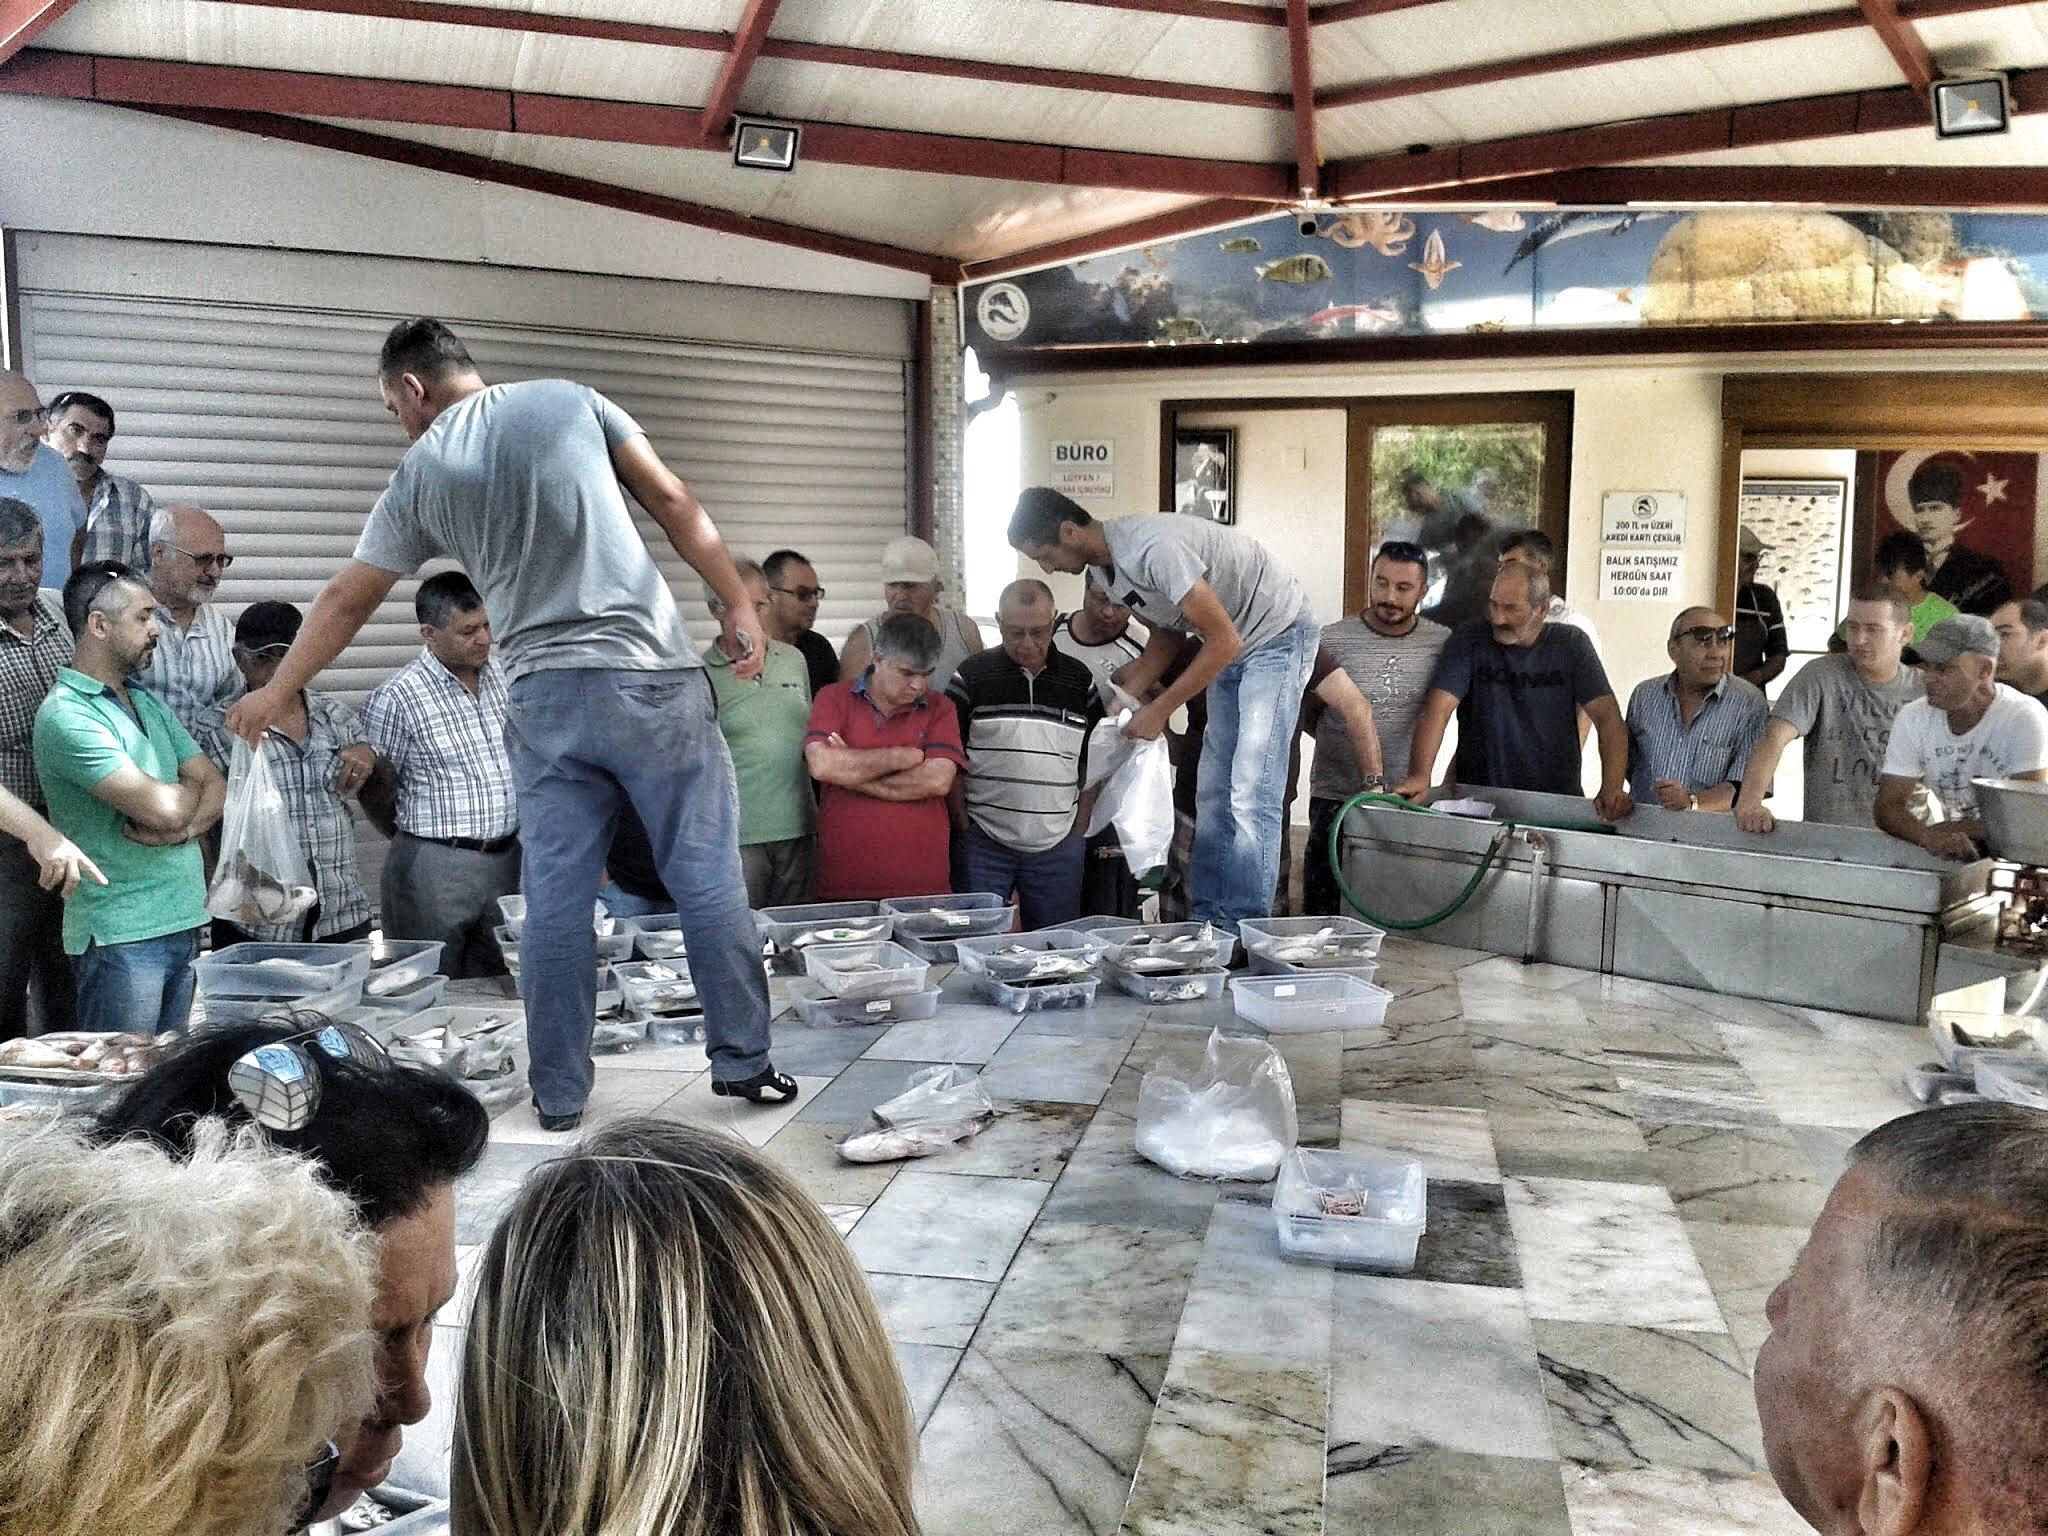 Fish market in Urla by Meriç Aksu